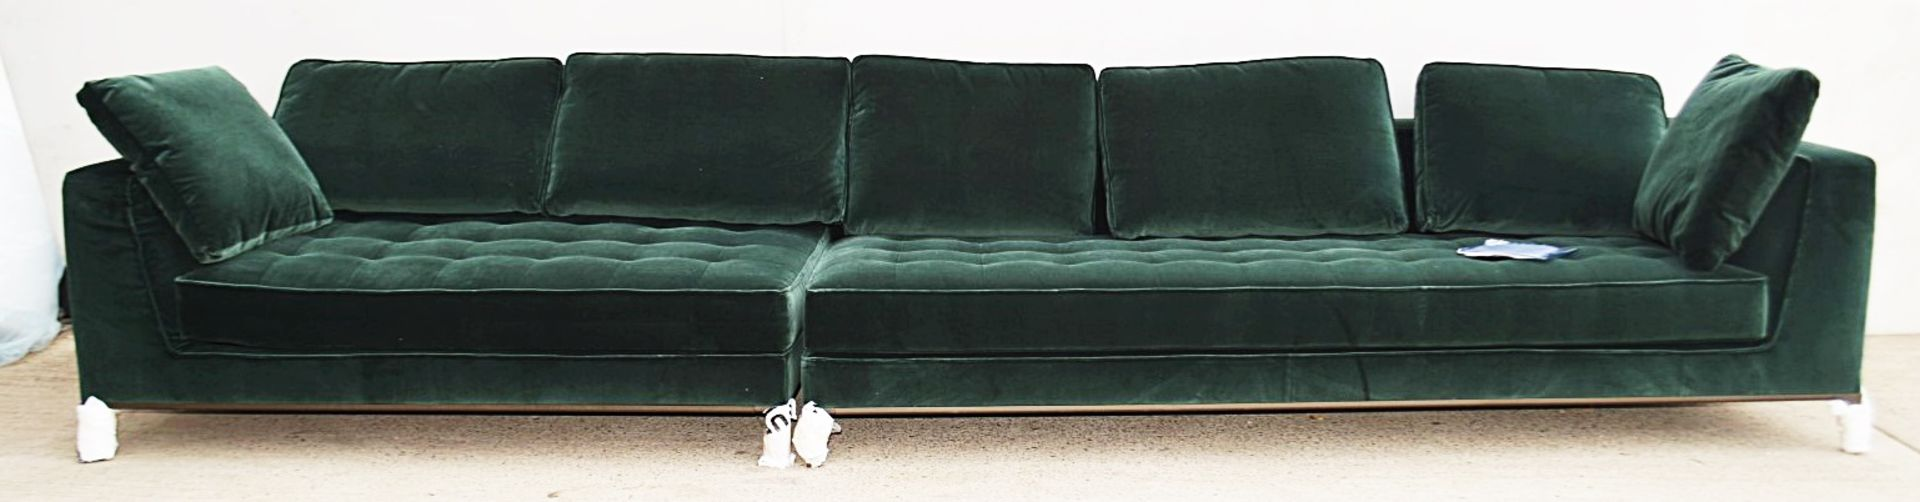 2 x B&B Italia MAXALTO Luxury Sofa Sections Both Upholstered In Rich Dark Green Velvet - RRP £7,248 - Image 5 of 13